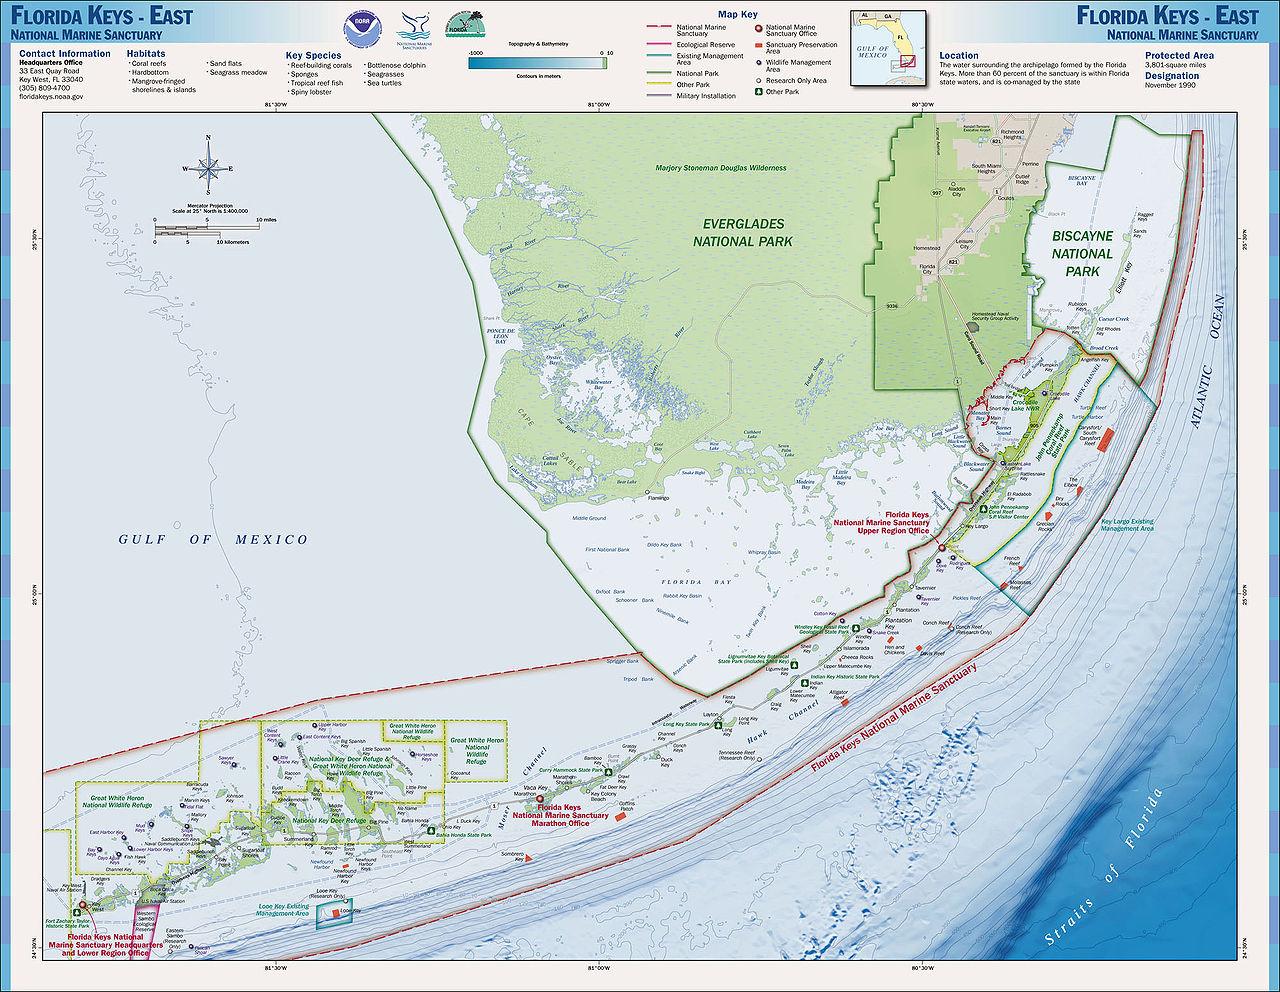 Charts And Maps Florida Keys - Florida Go Fishing - Florida Keys Fishing Map